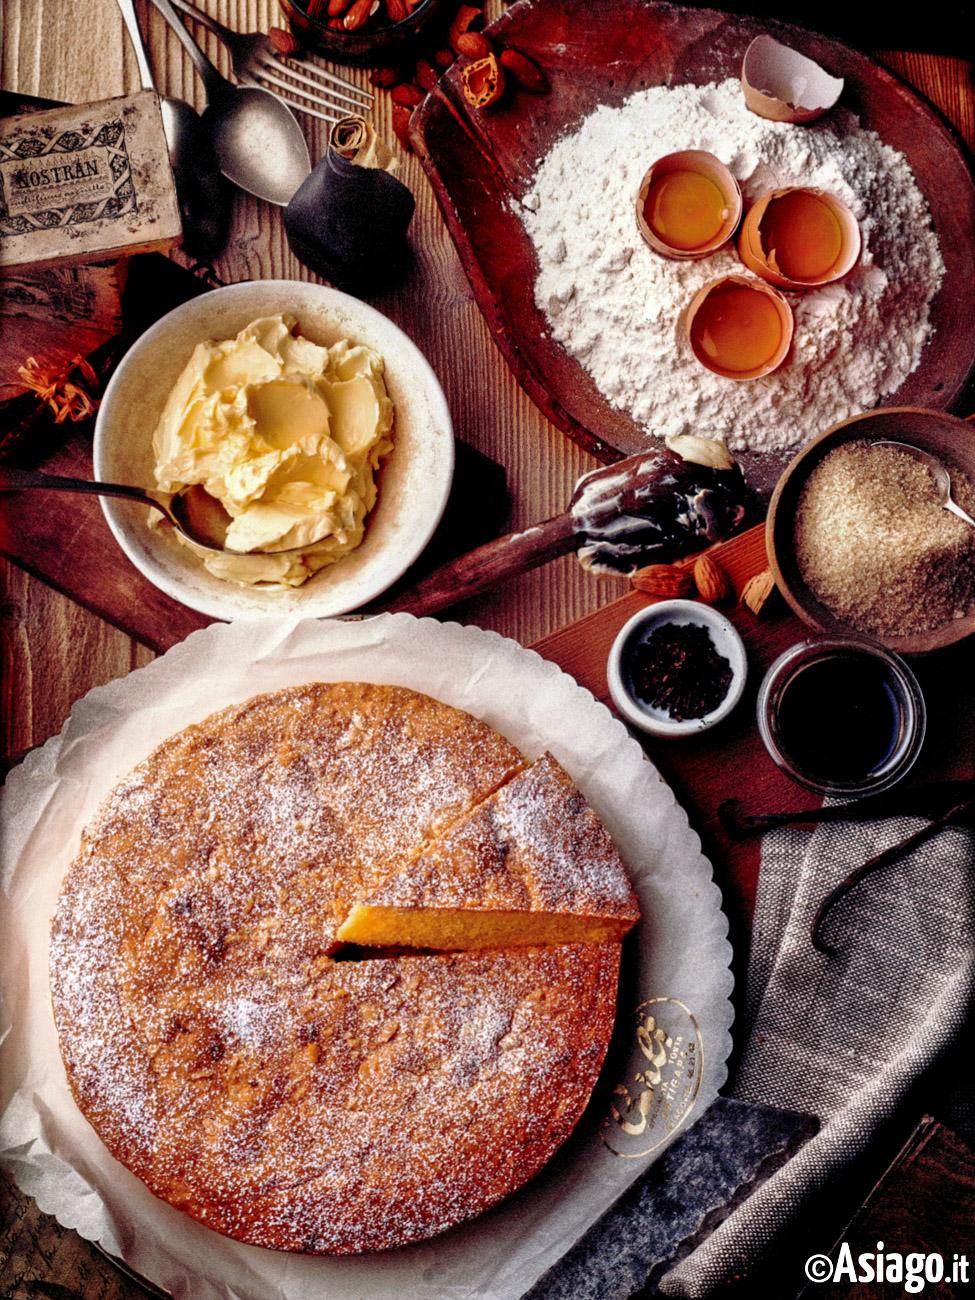 Ricetta Torta Ortigara.Ortigara Cake And Carli Pastry Specialties Torta Ortigara Pasticceria Carli Asiago Plateau 7 Mun